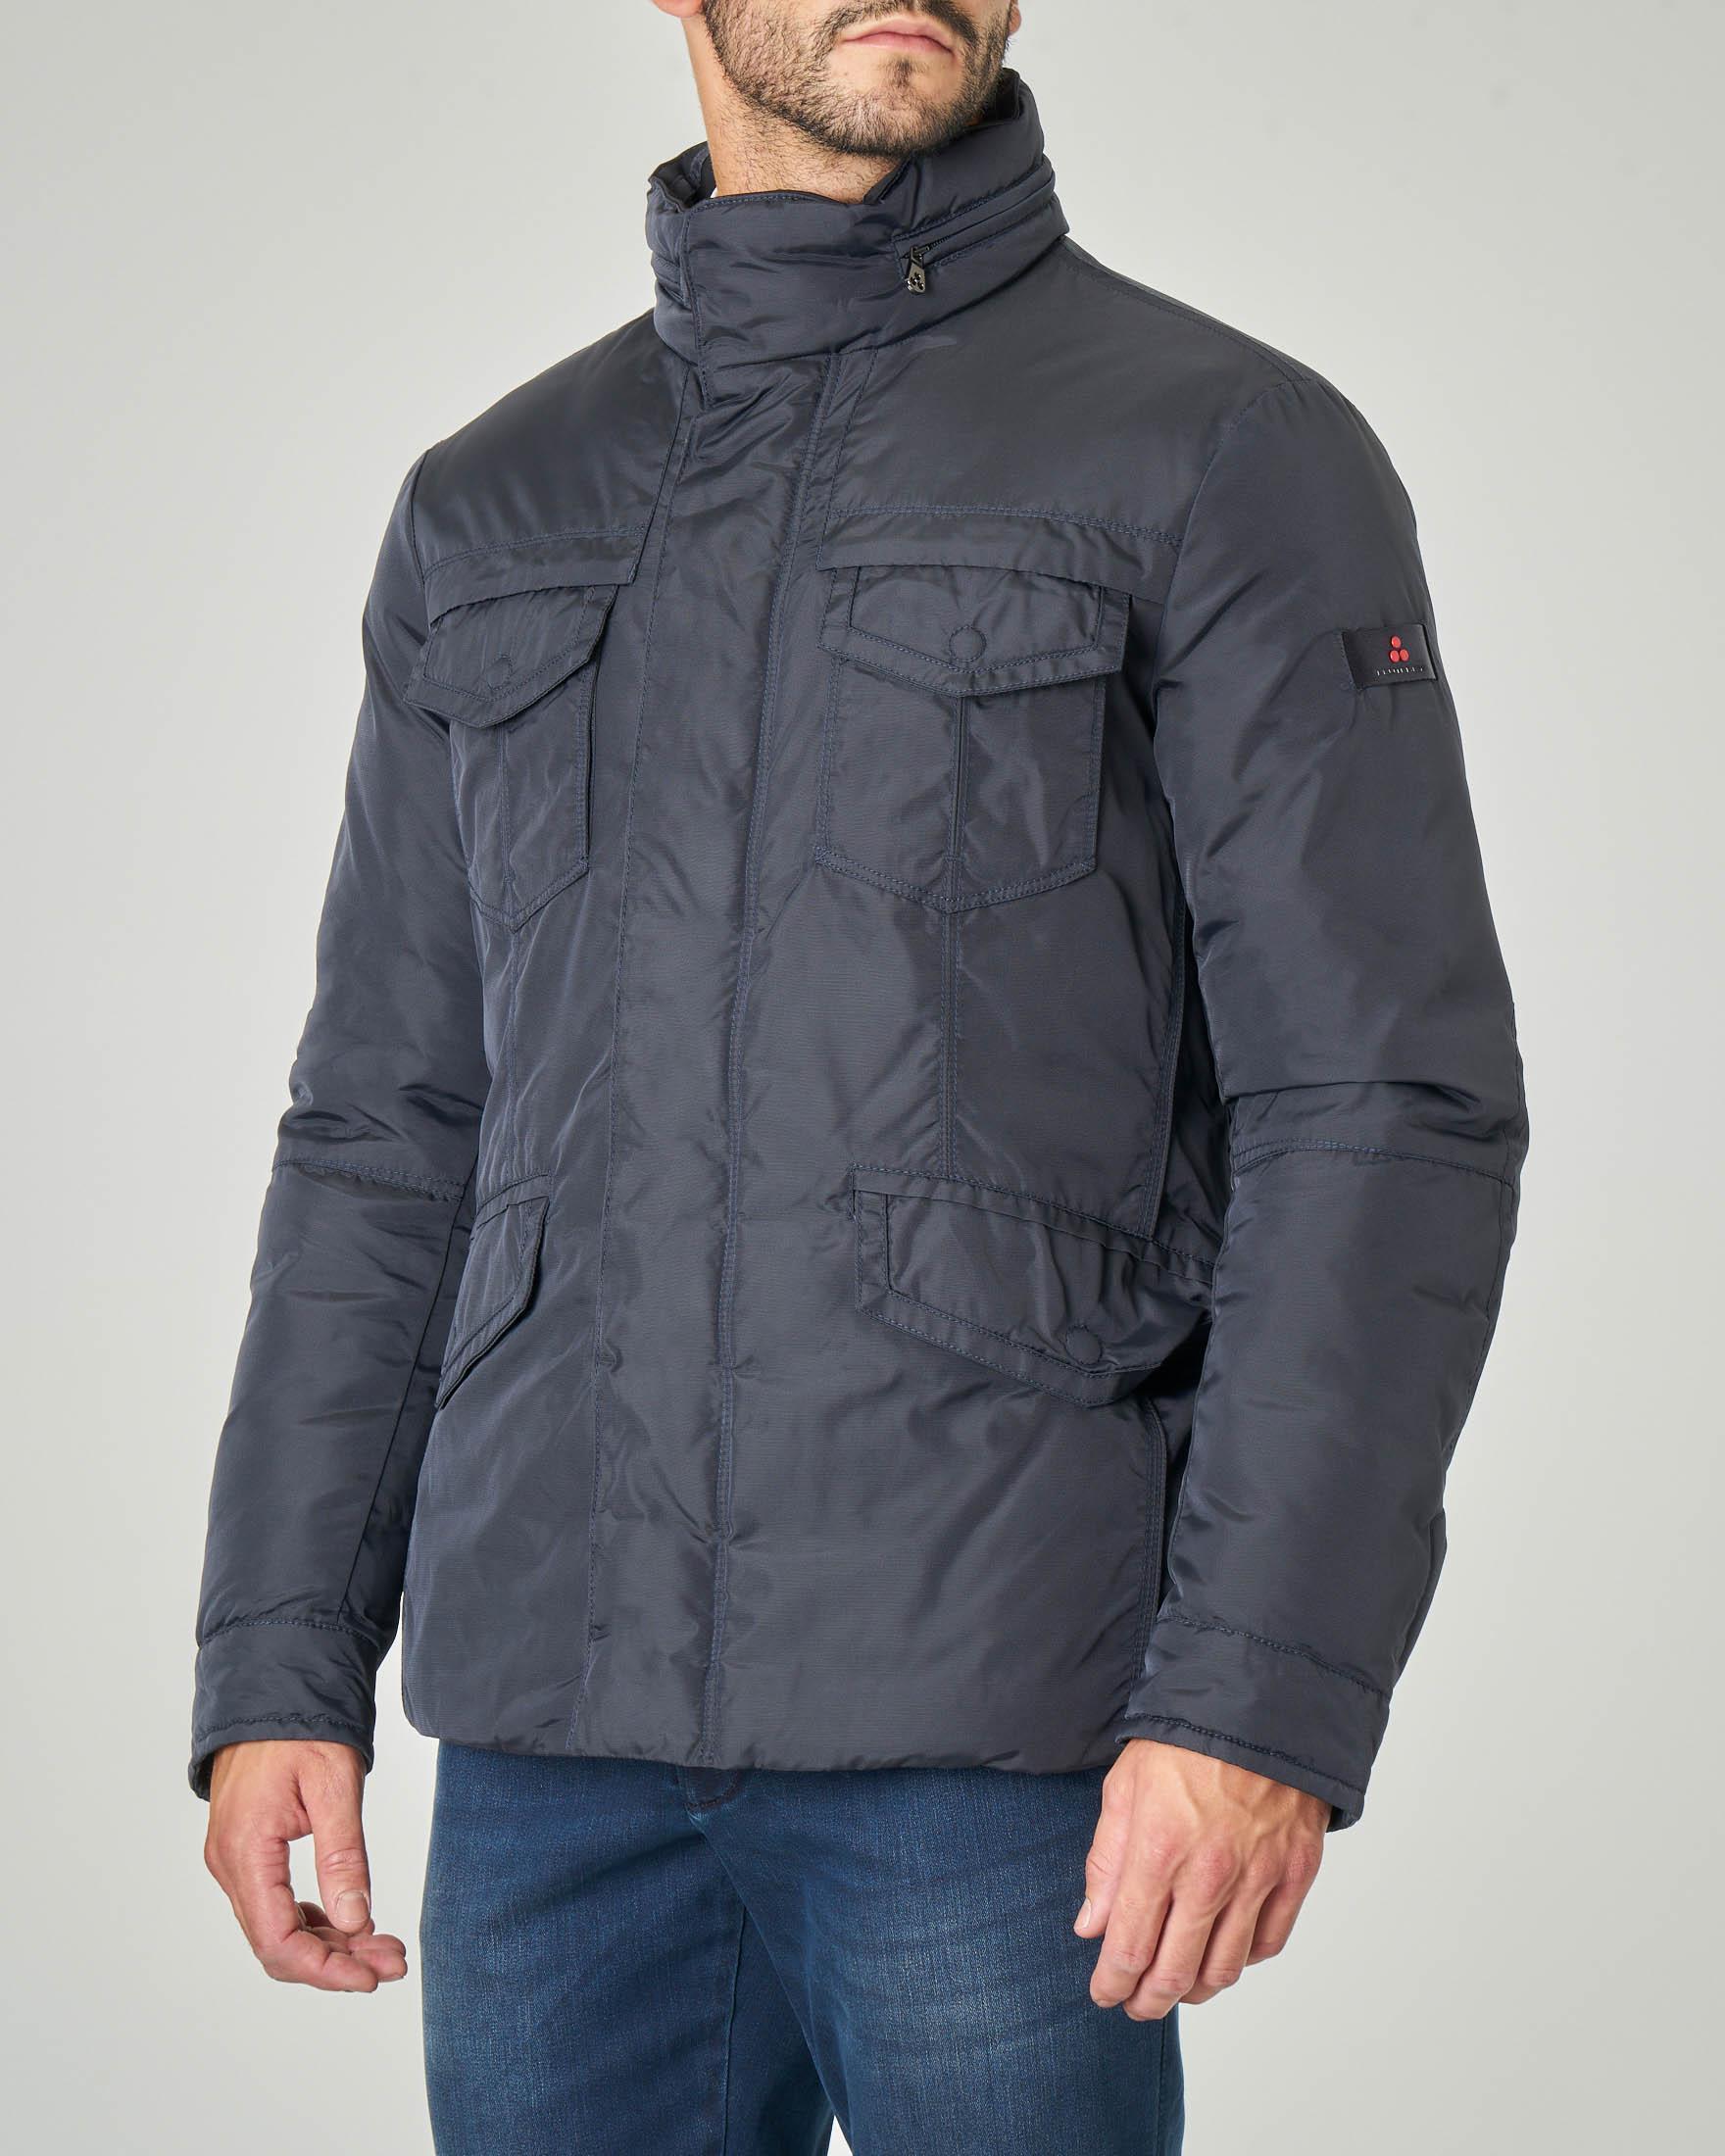 Field Jacket Stripes blu in tessuto oxford tecnico